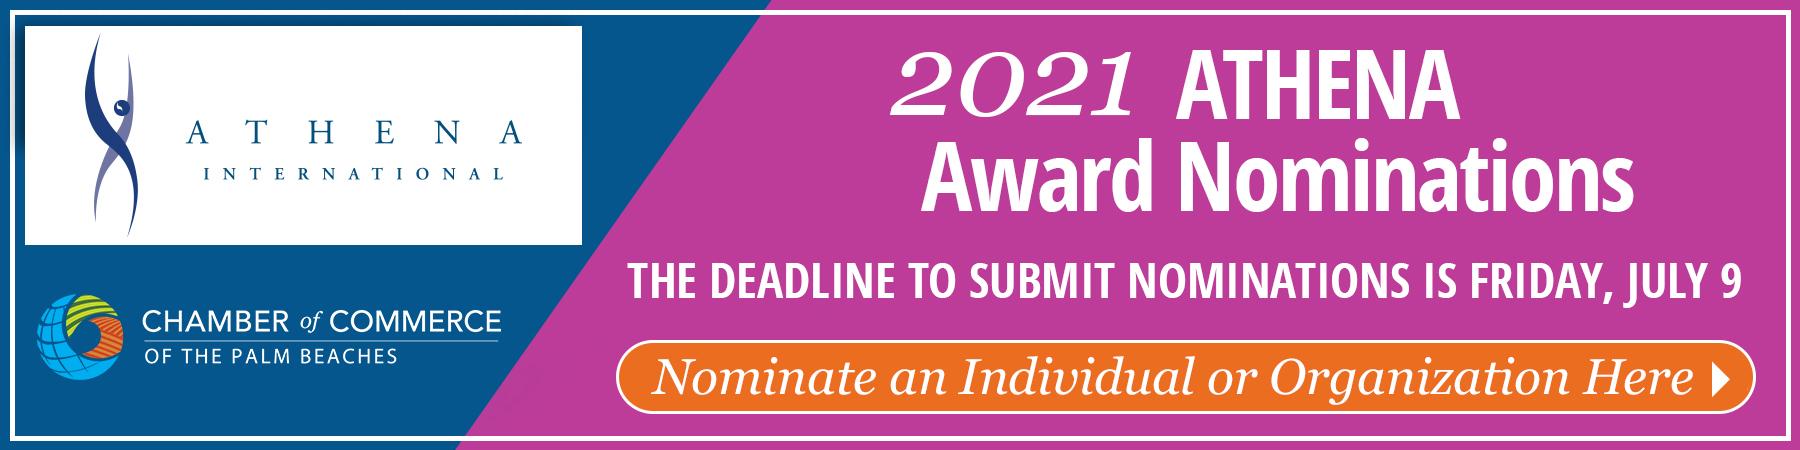 ATHENA_Nominations_WebBanner_6.2.2021